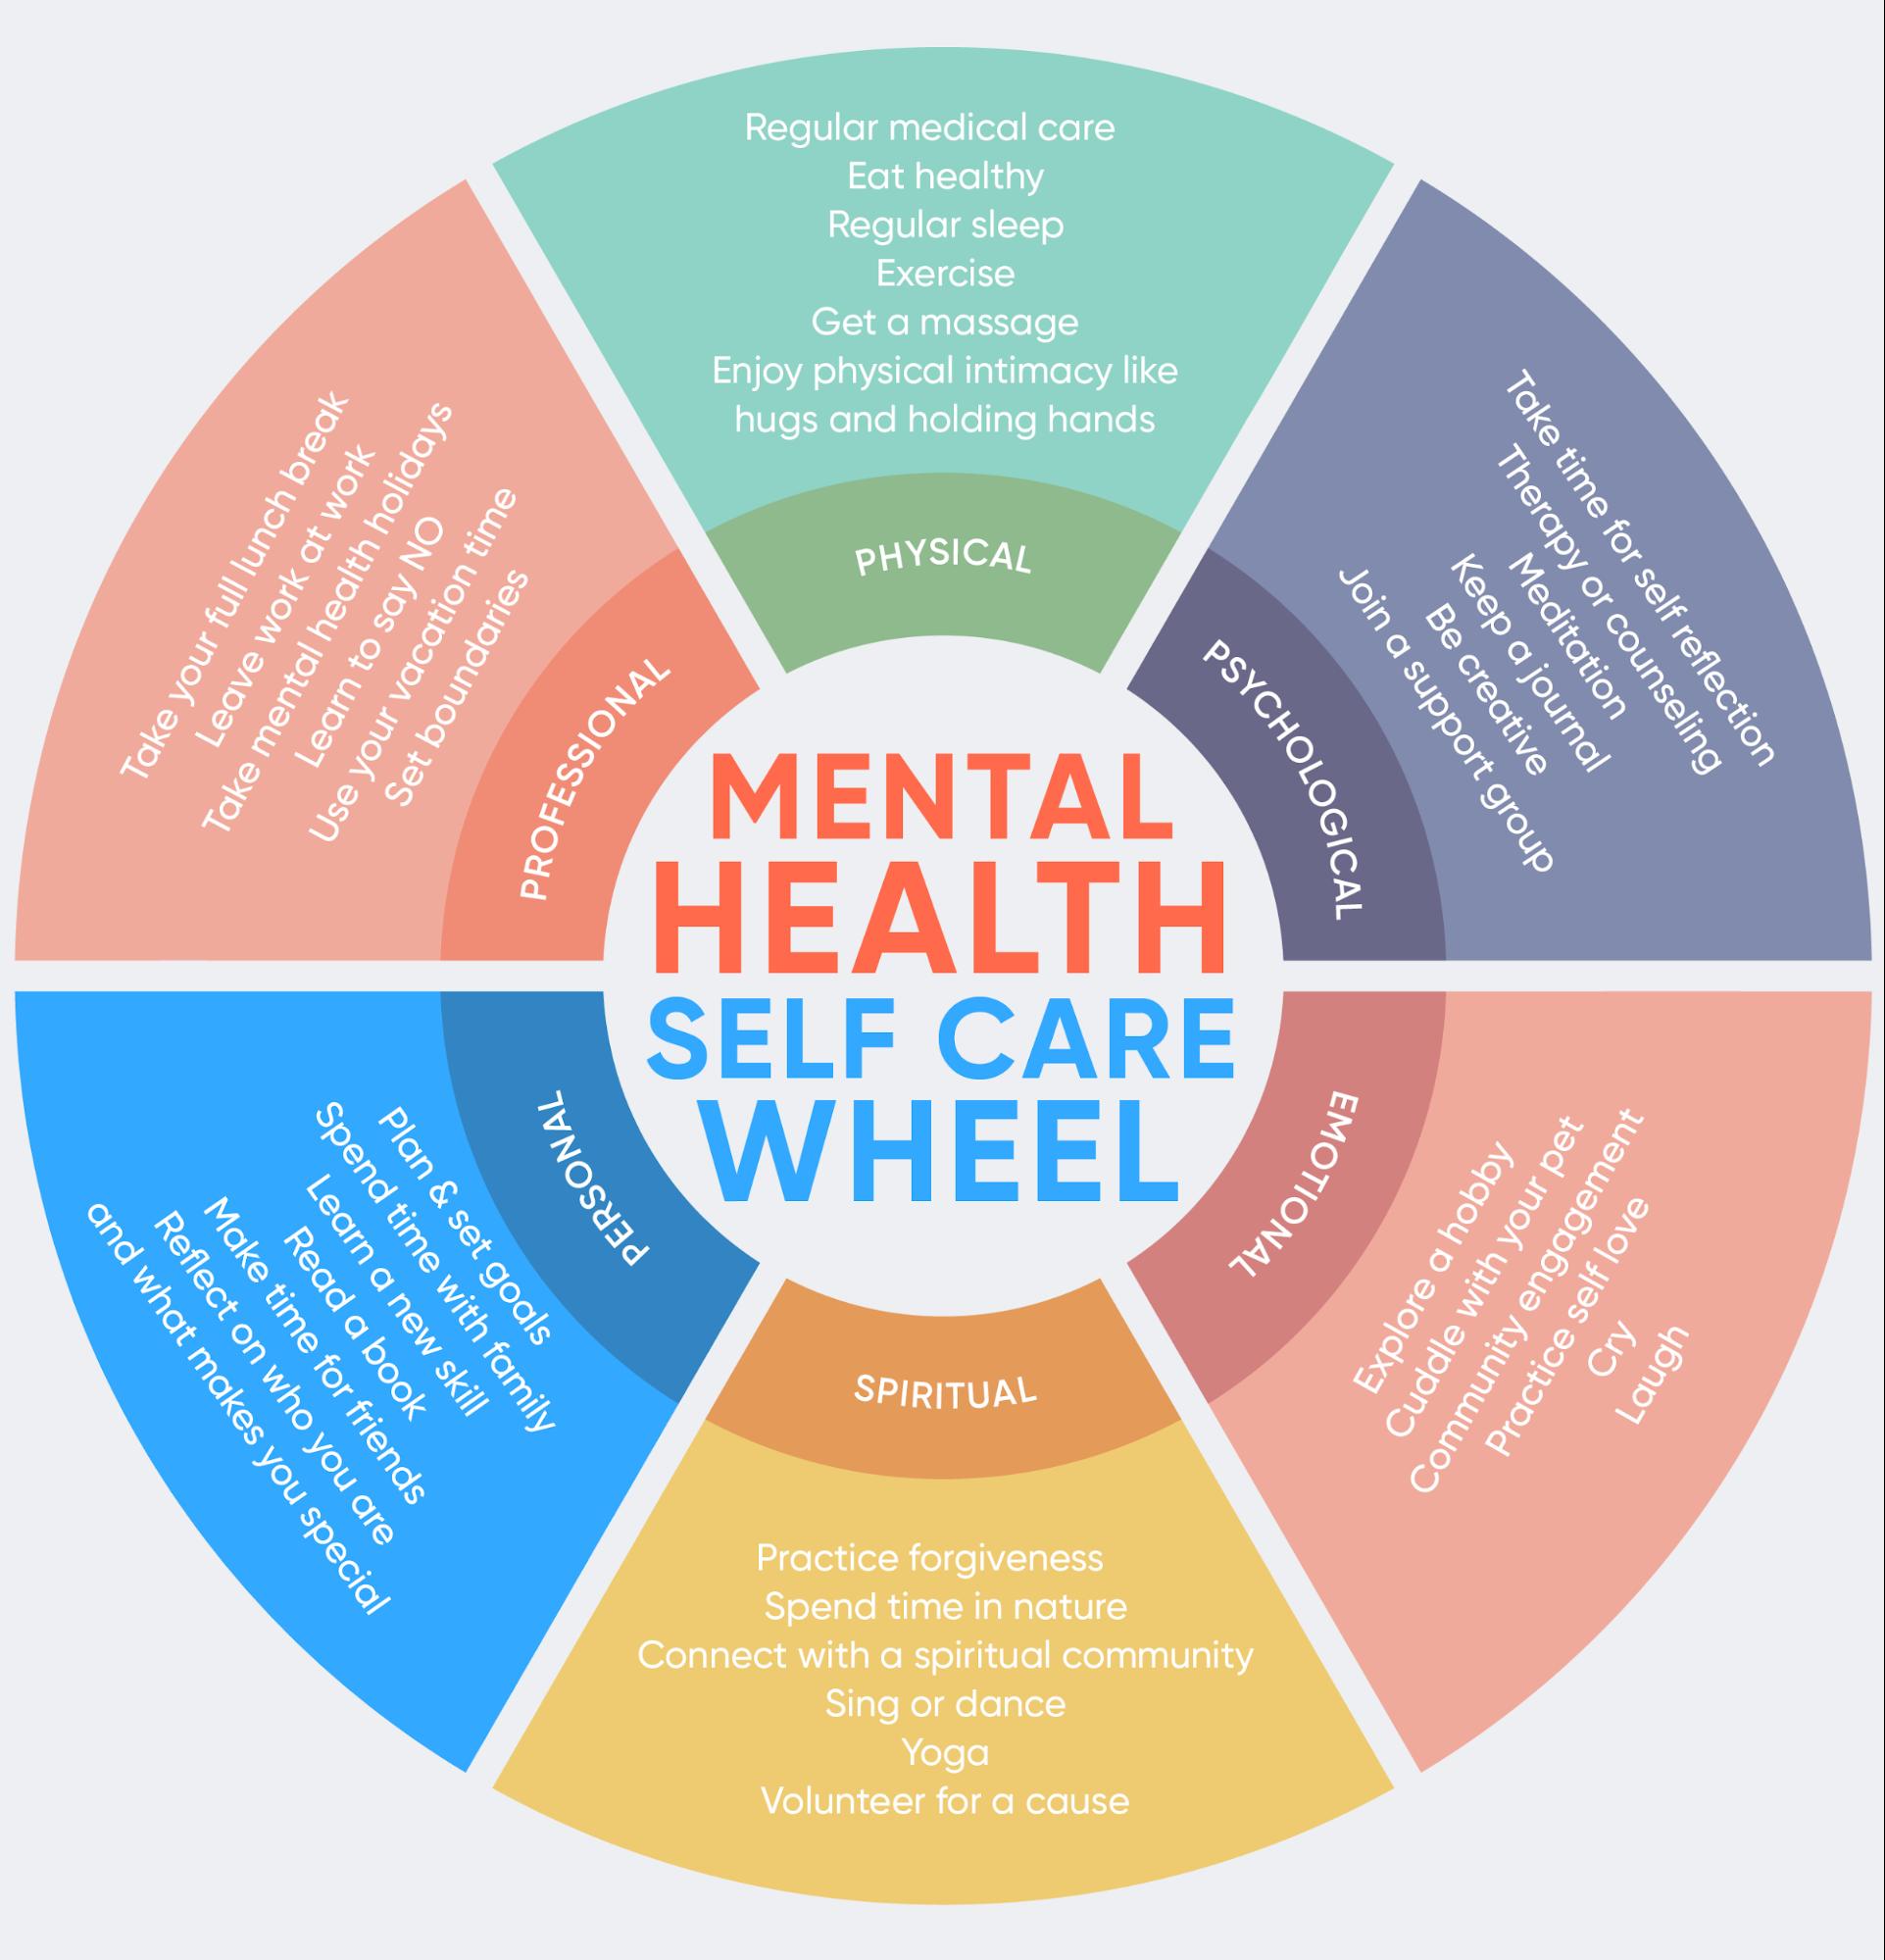 mental health self care wheel